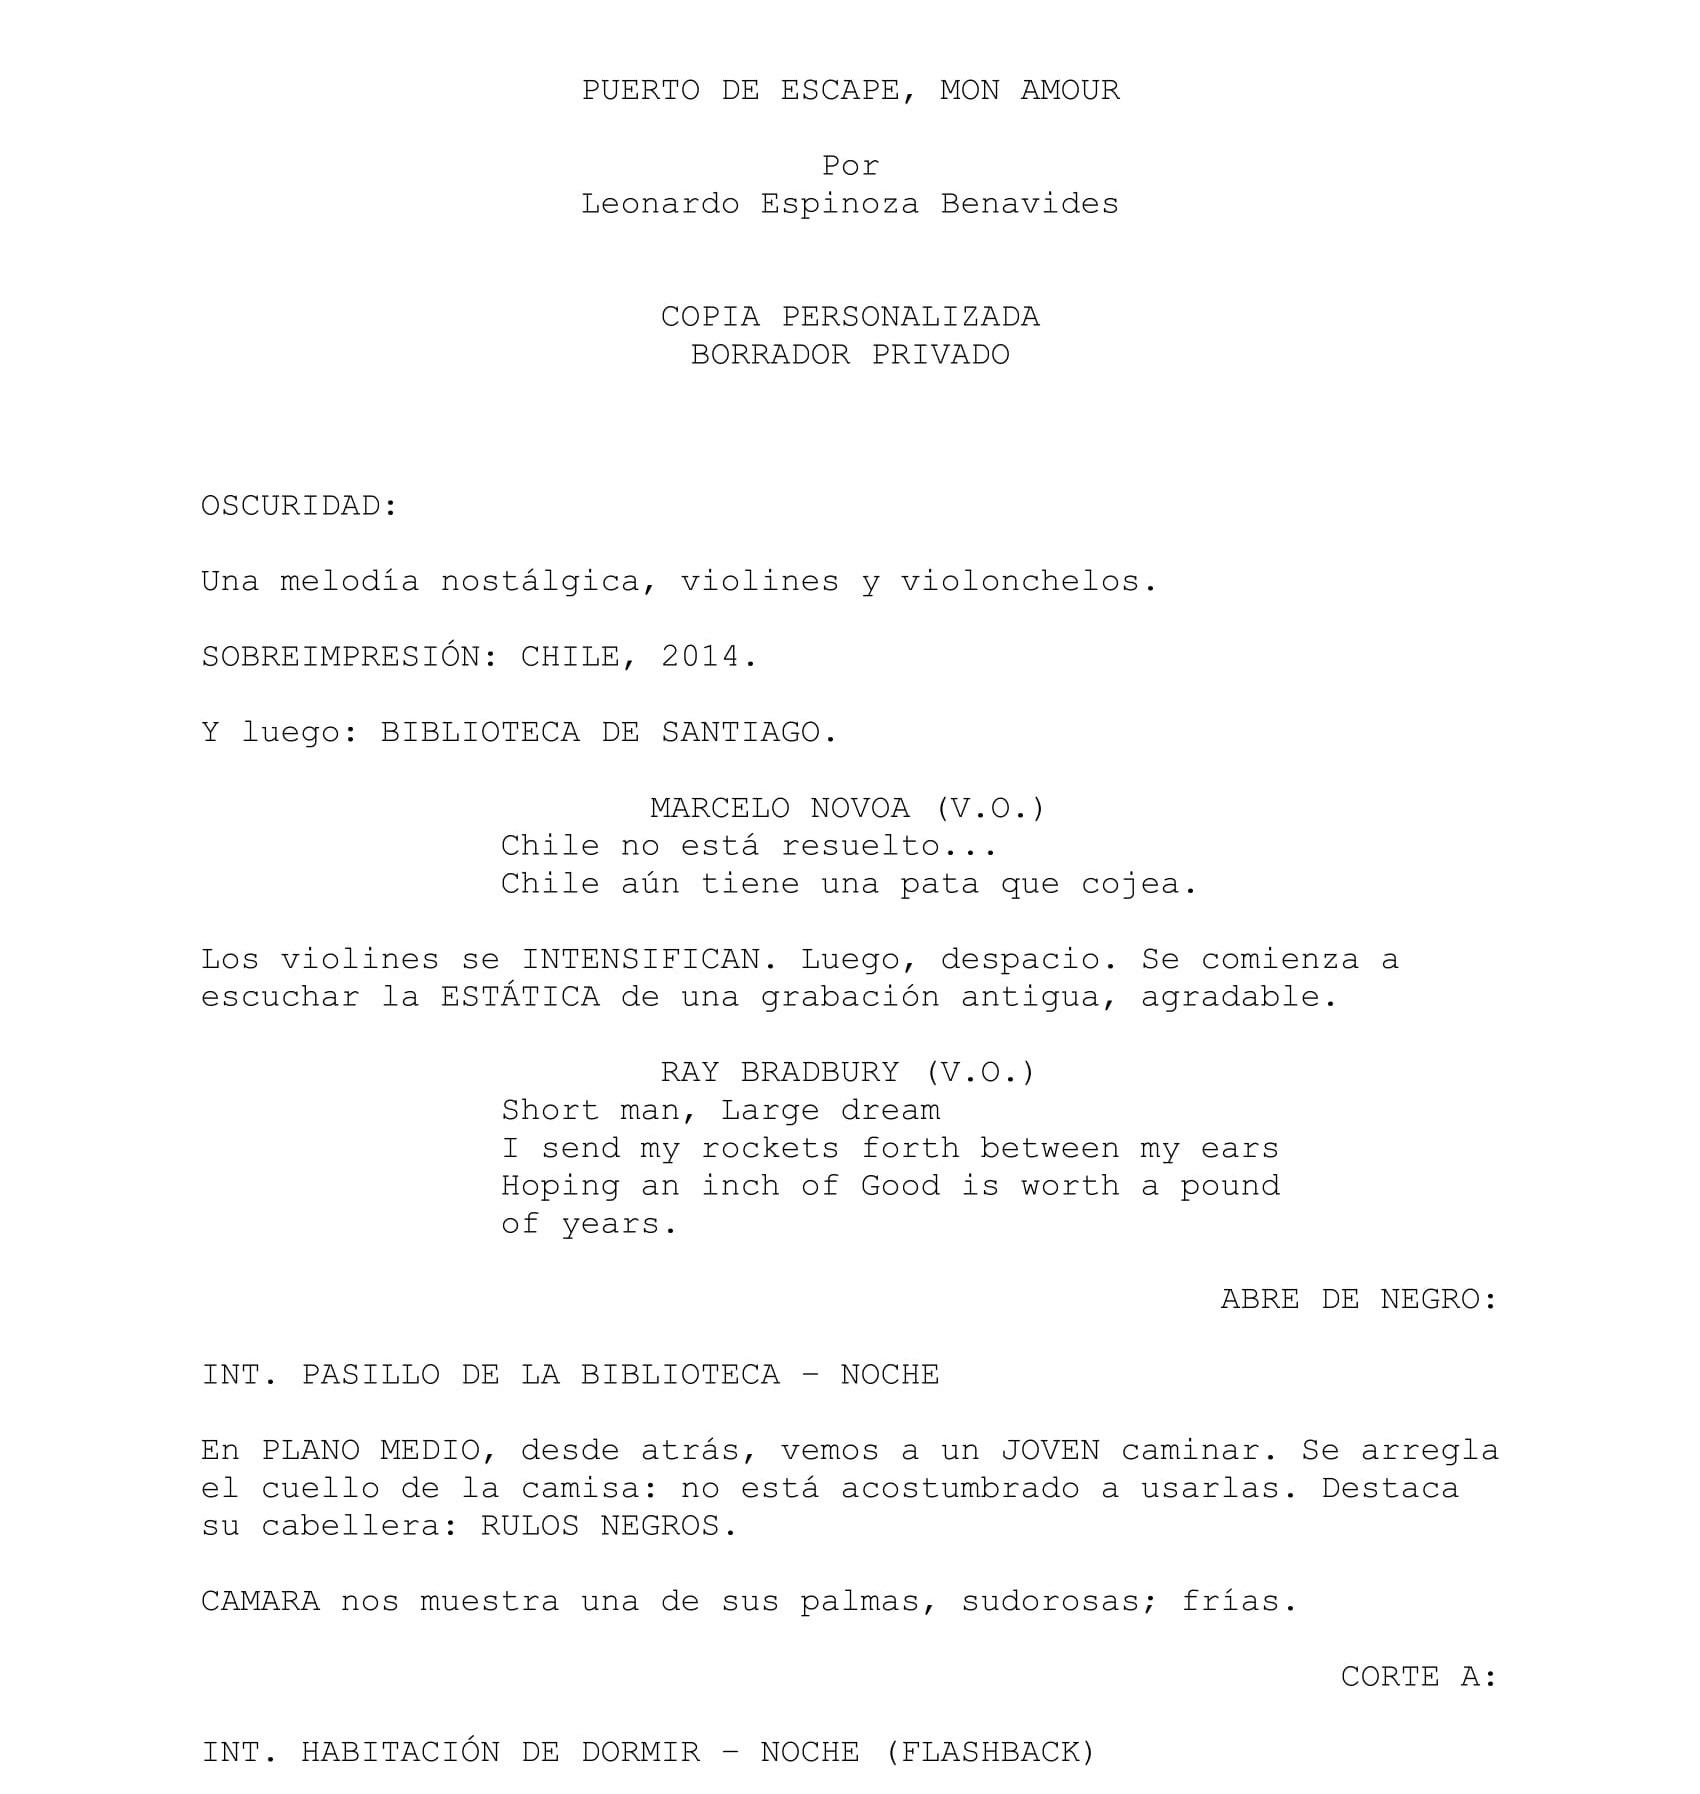 Screenplay1